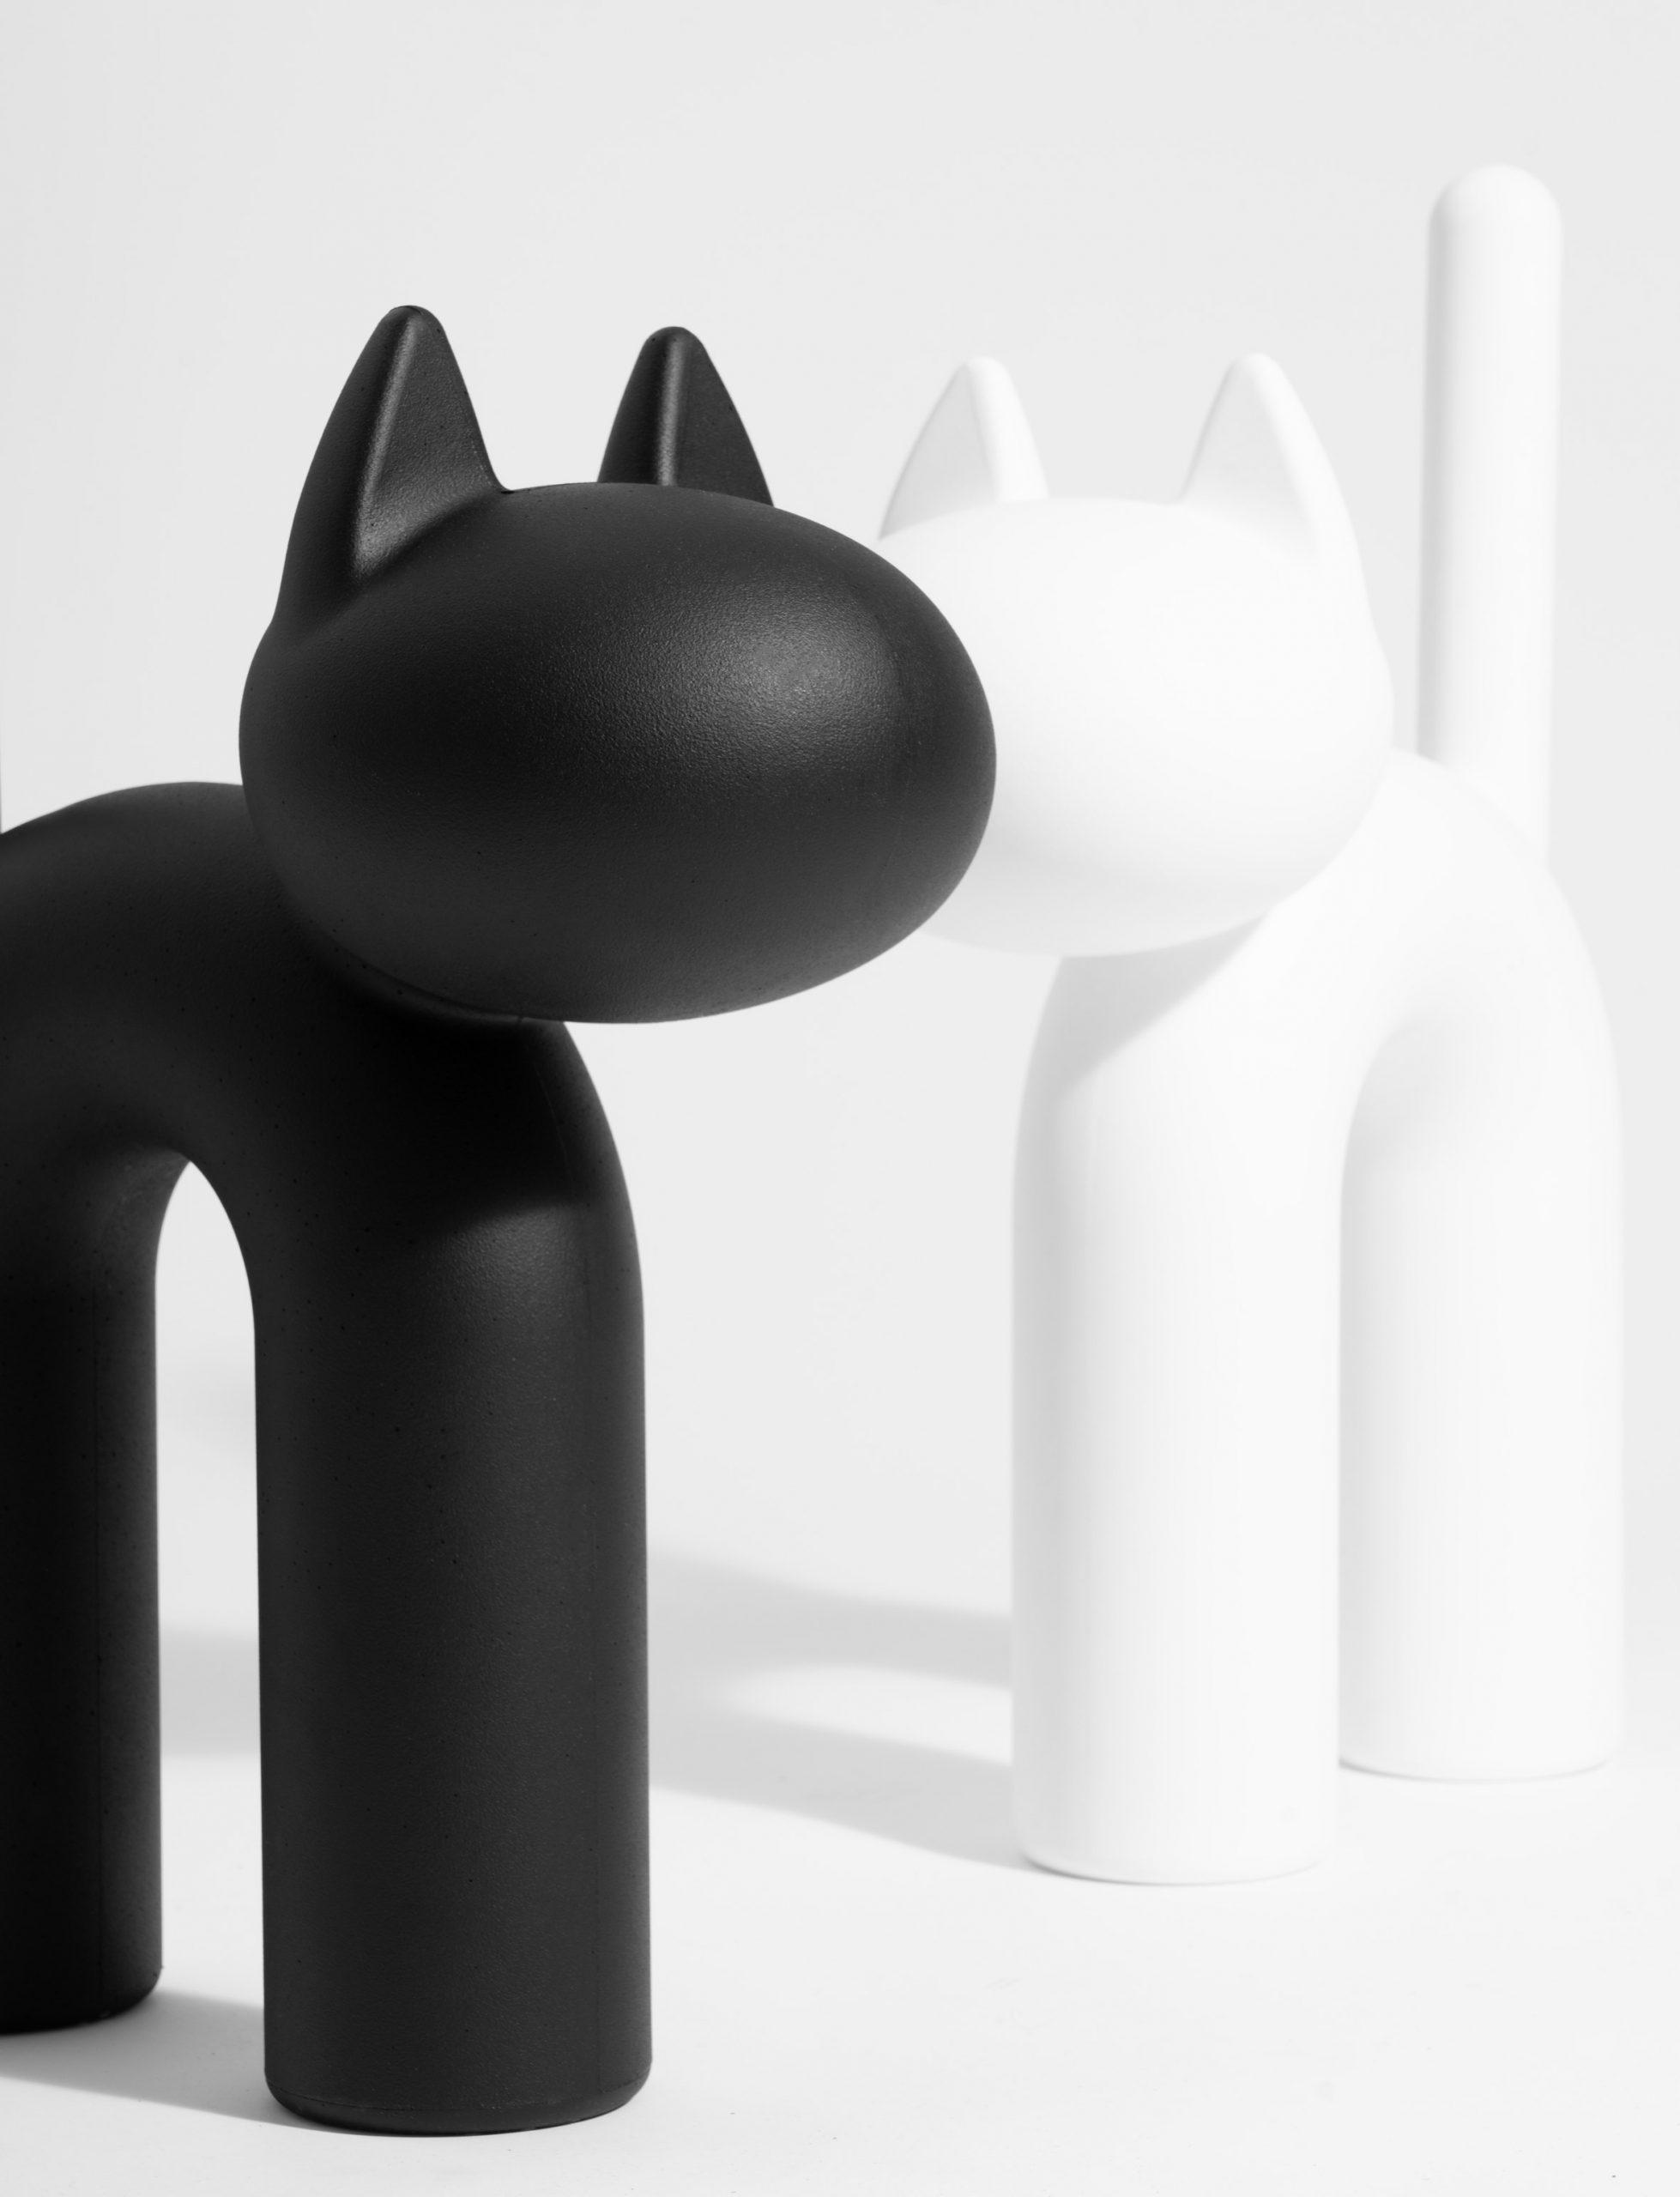 The Kisu cat ornament by Eero Aarnio